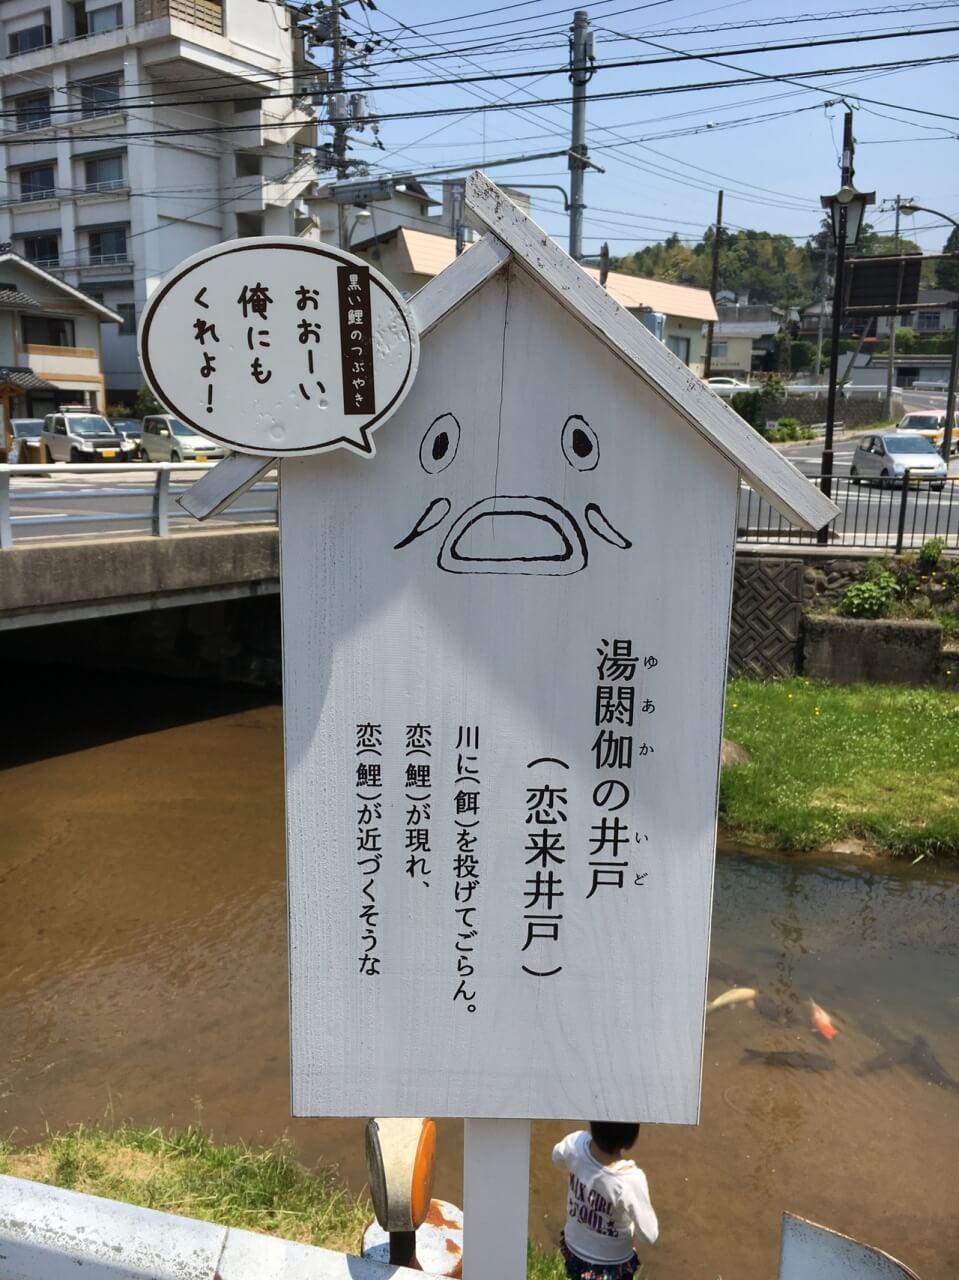 湯閼伽の井戸 (恋来井戸)